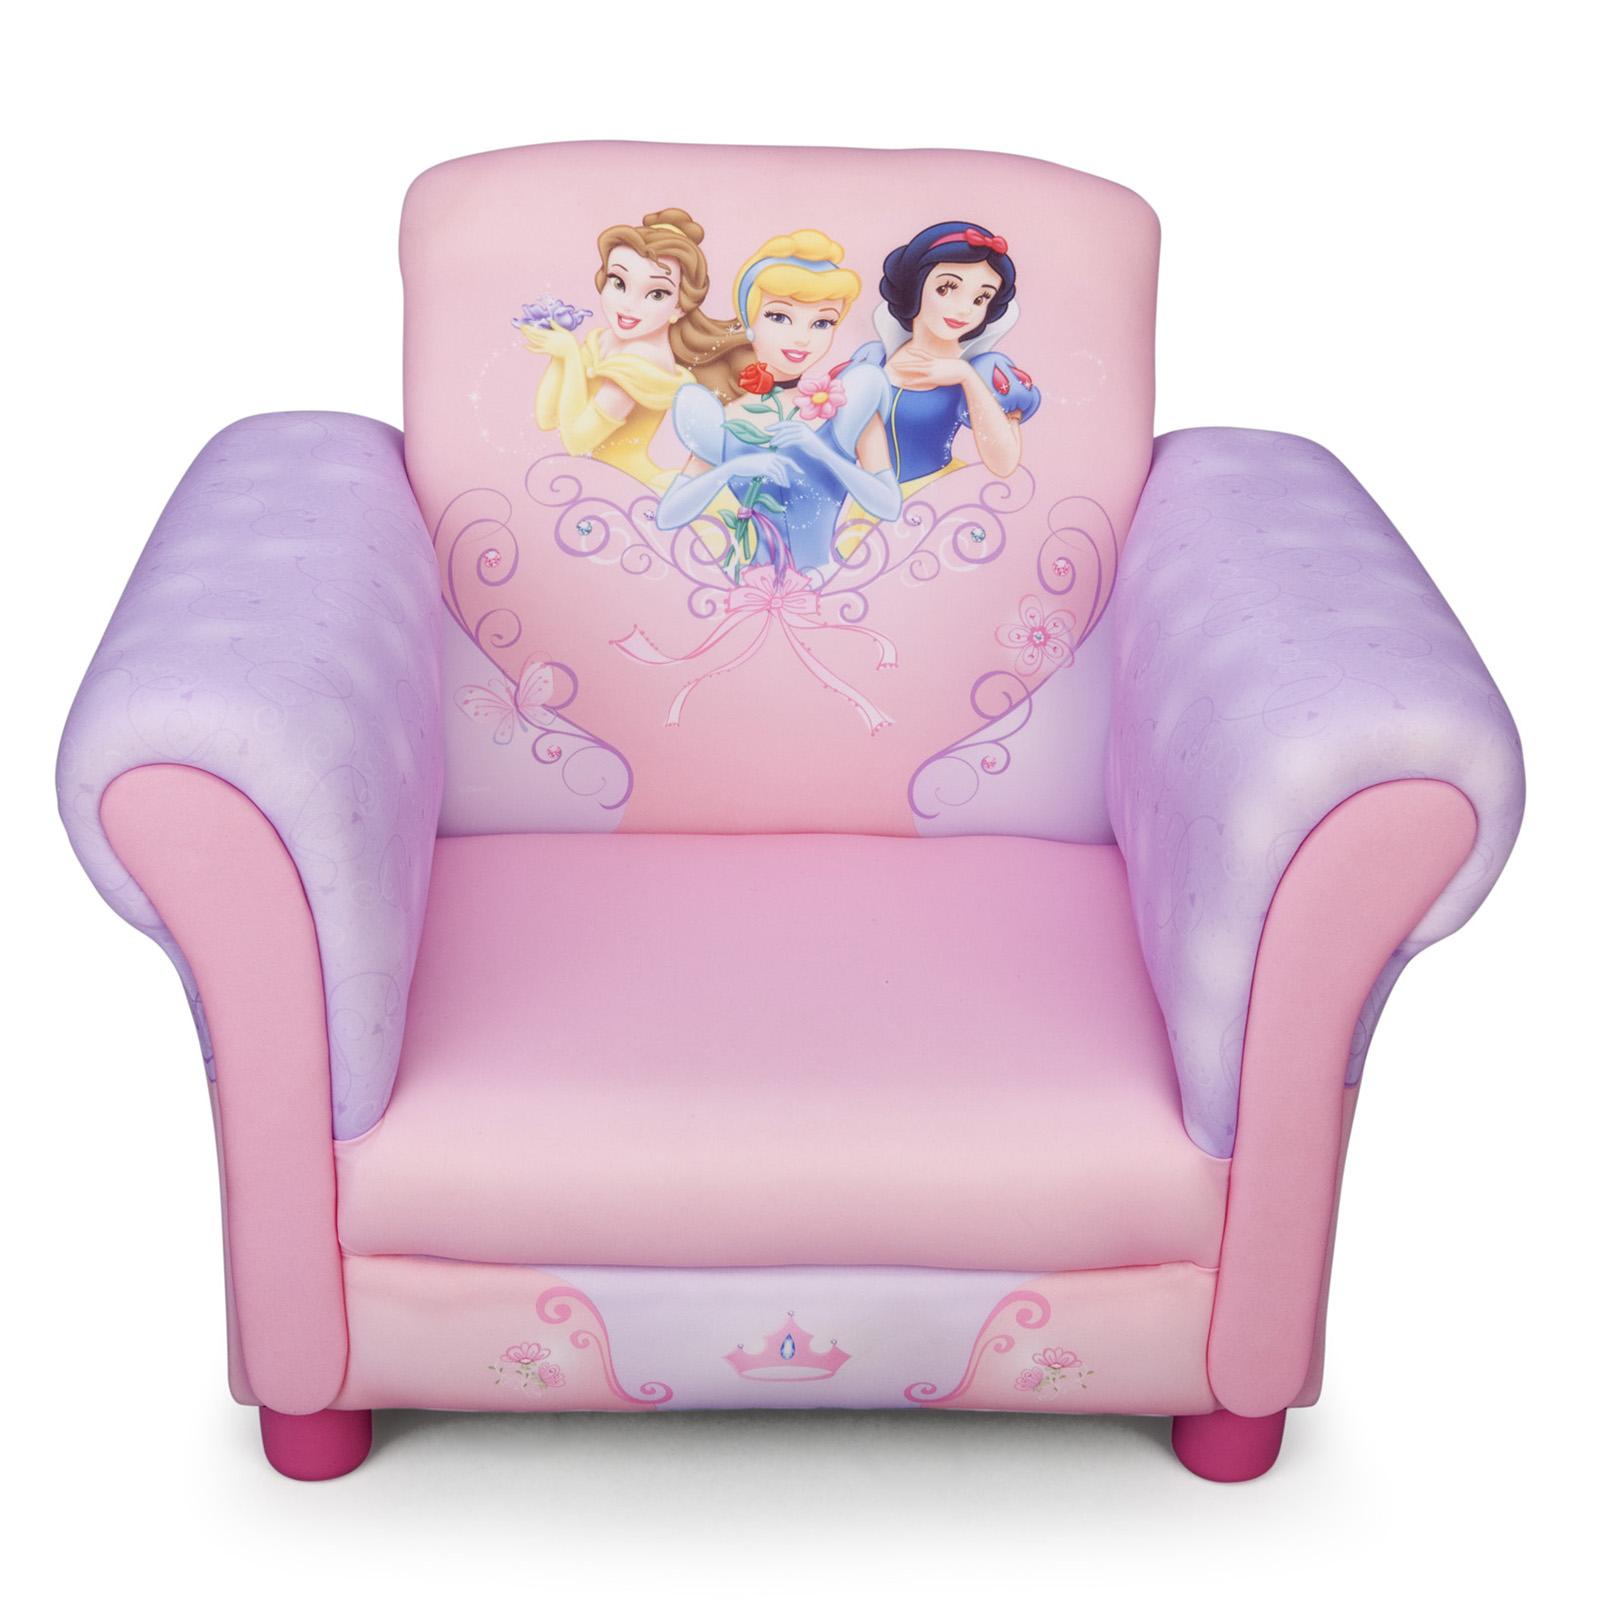 Disney Princess Armchair: NEW DELTA CHILDREN DISNEY PRINCESS UPHOLSTERED PINK CHAIR